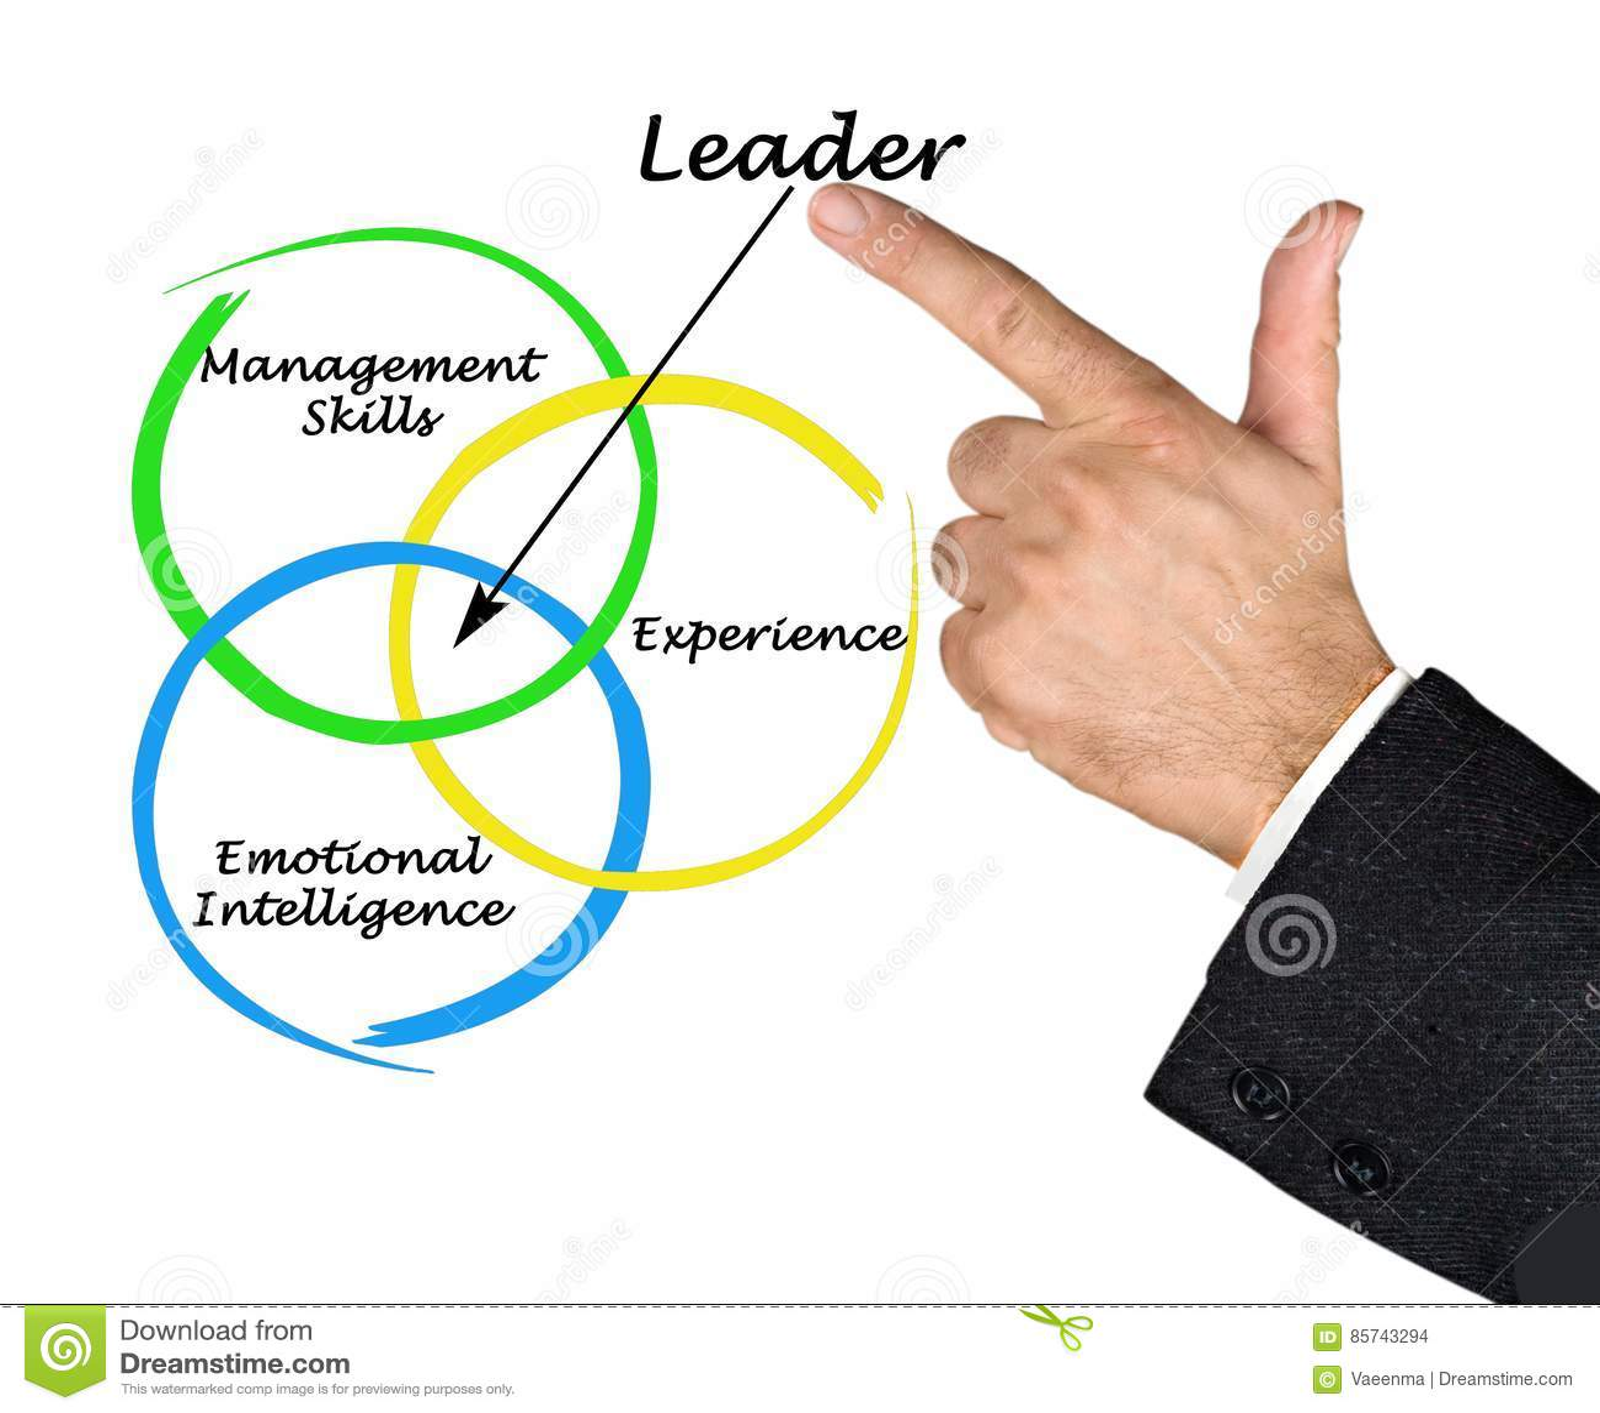 Leader qualities